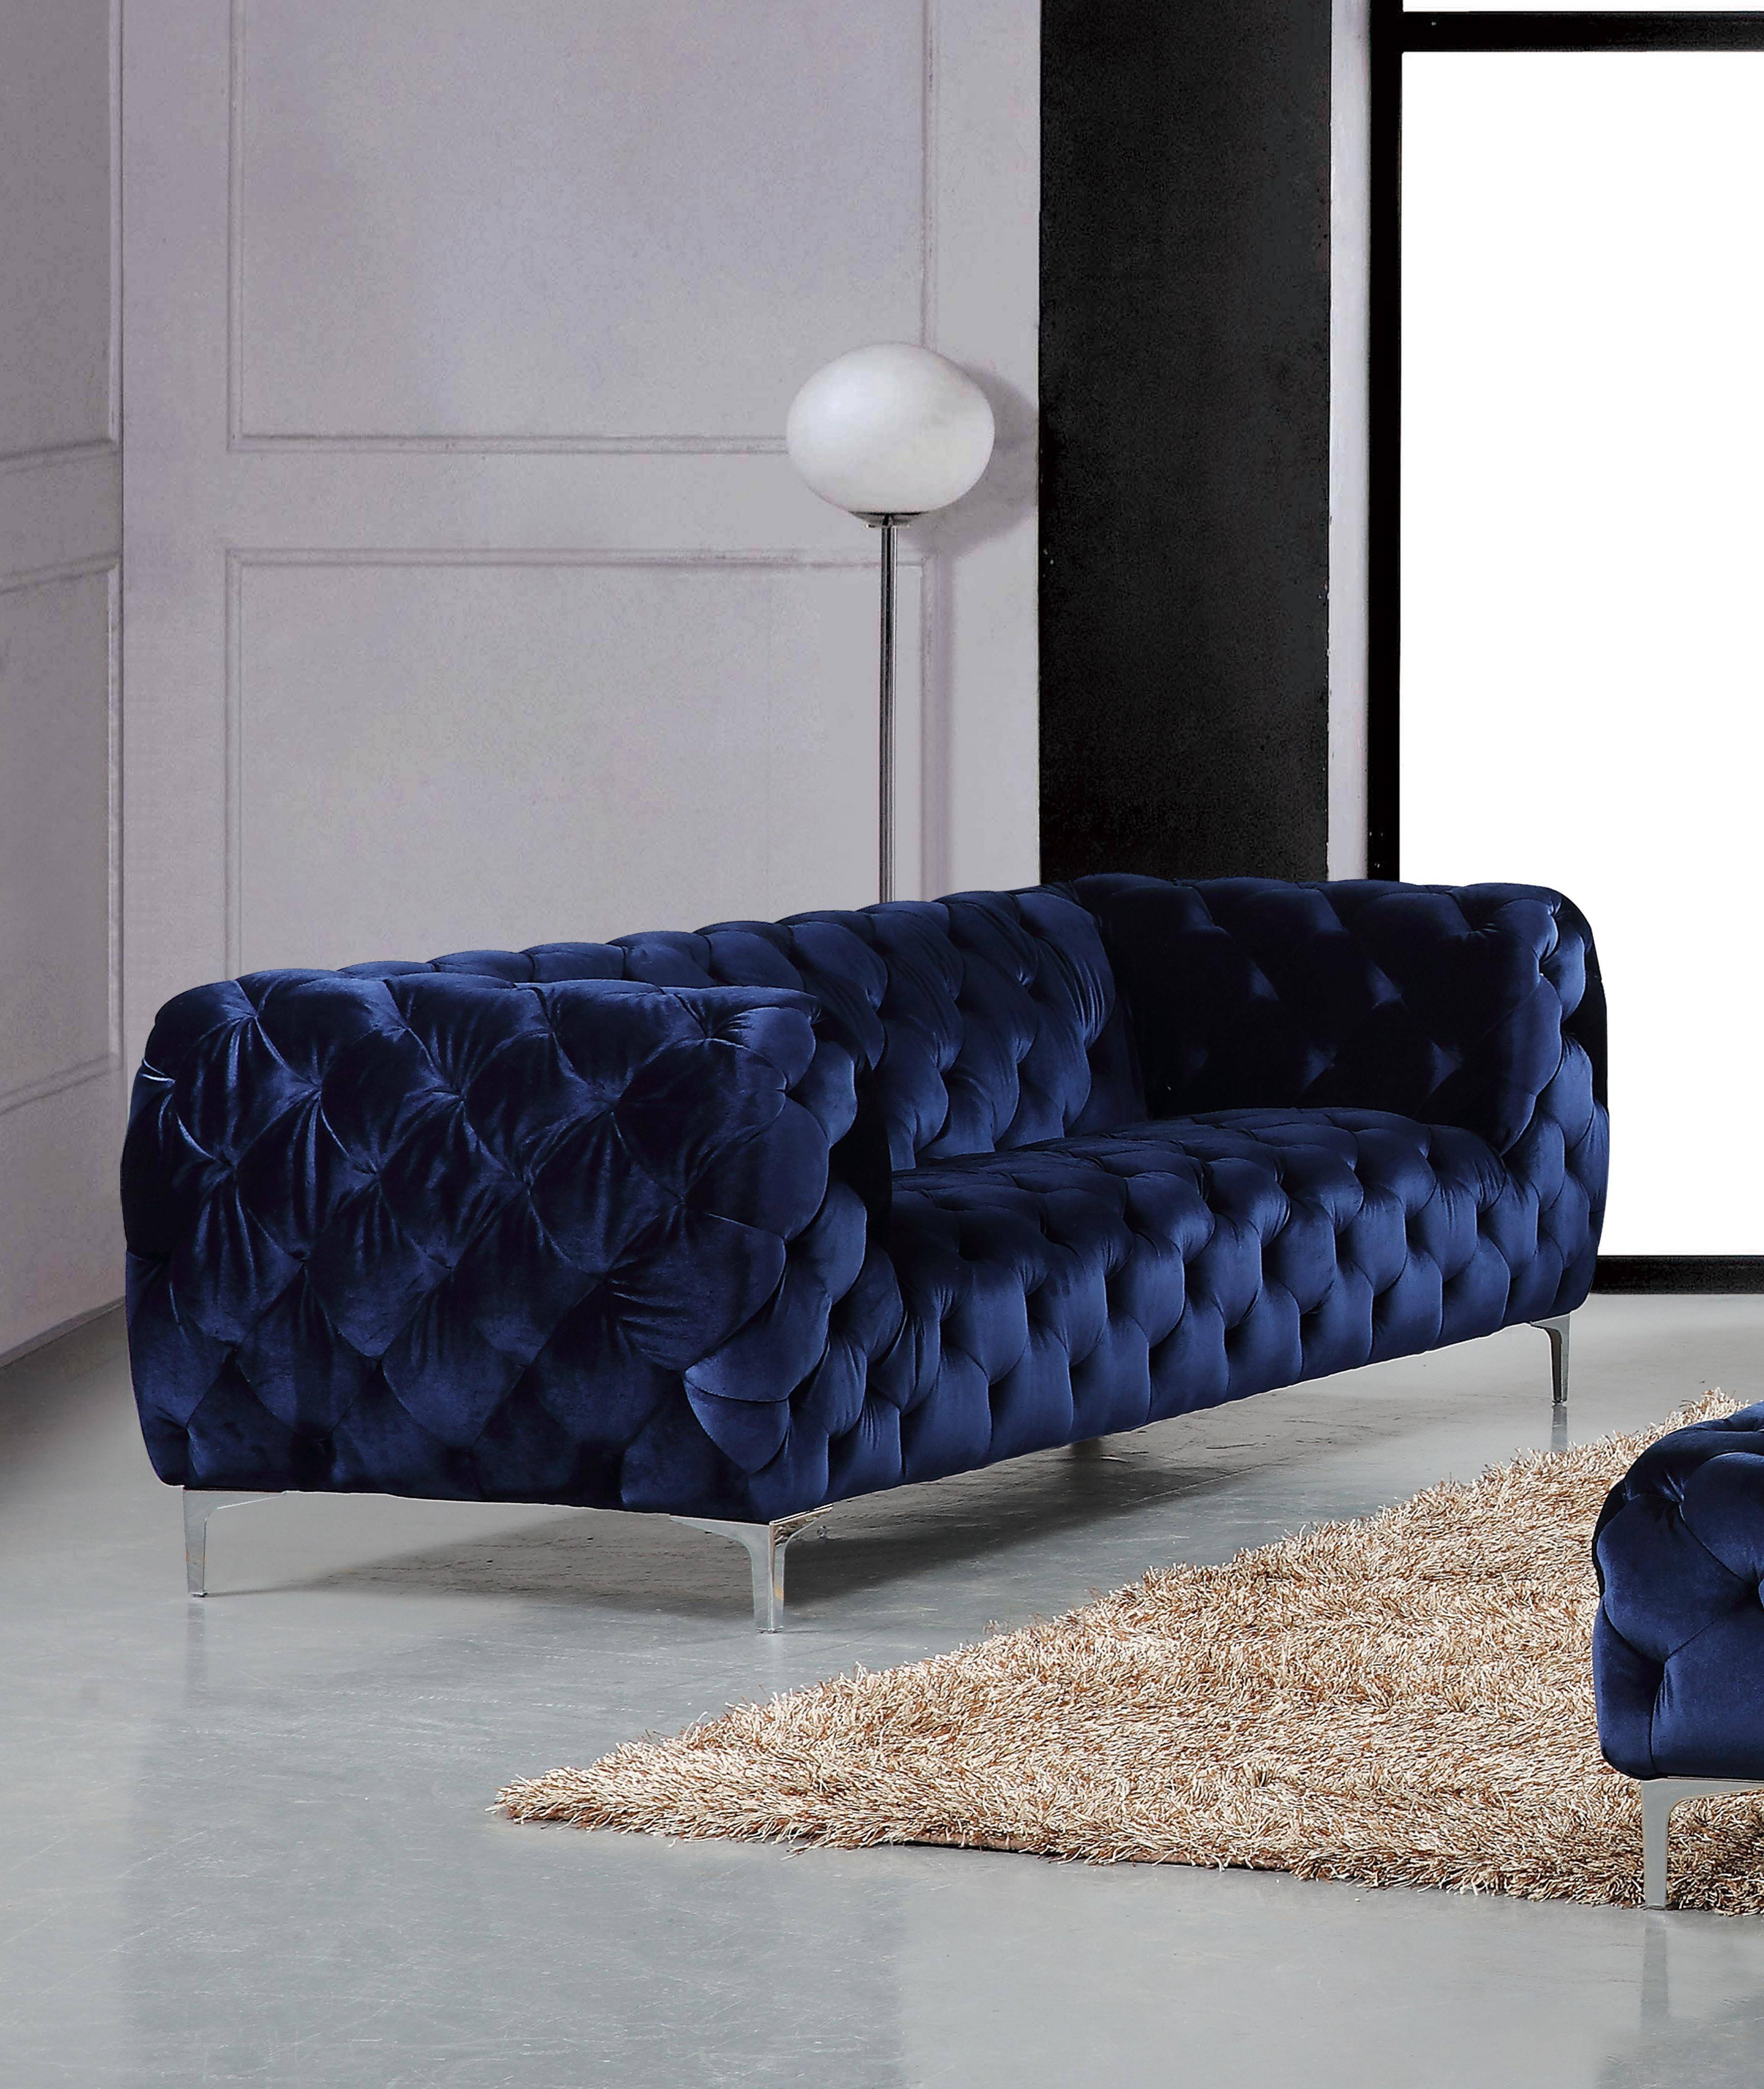 Meridian 646 Mercer Navy Tufted Sofa Contemporary Modern (646 Mercer Pertaining To Mercer Foam Oversized Sofa Chairs (View 17 of 25)